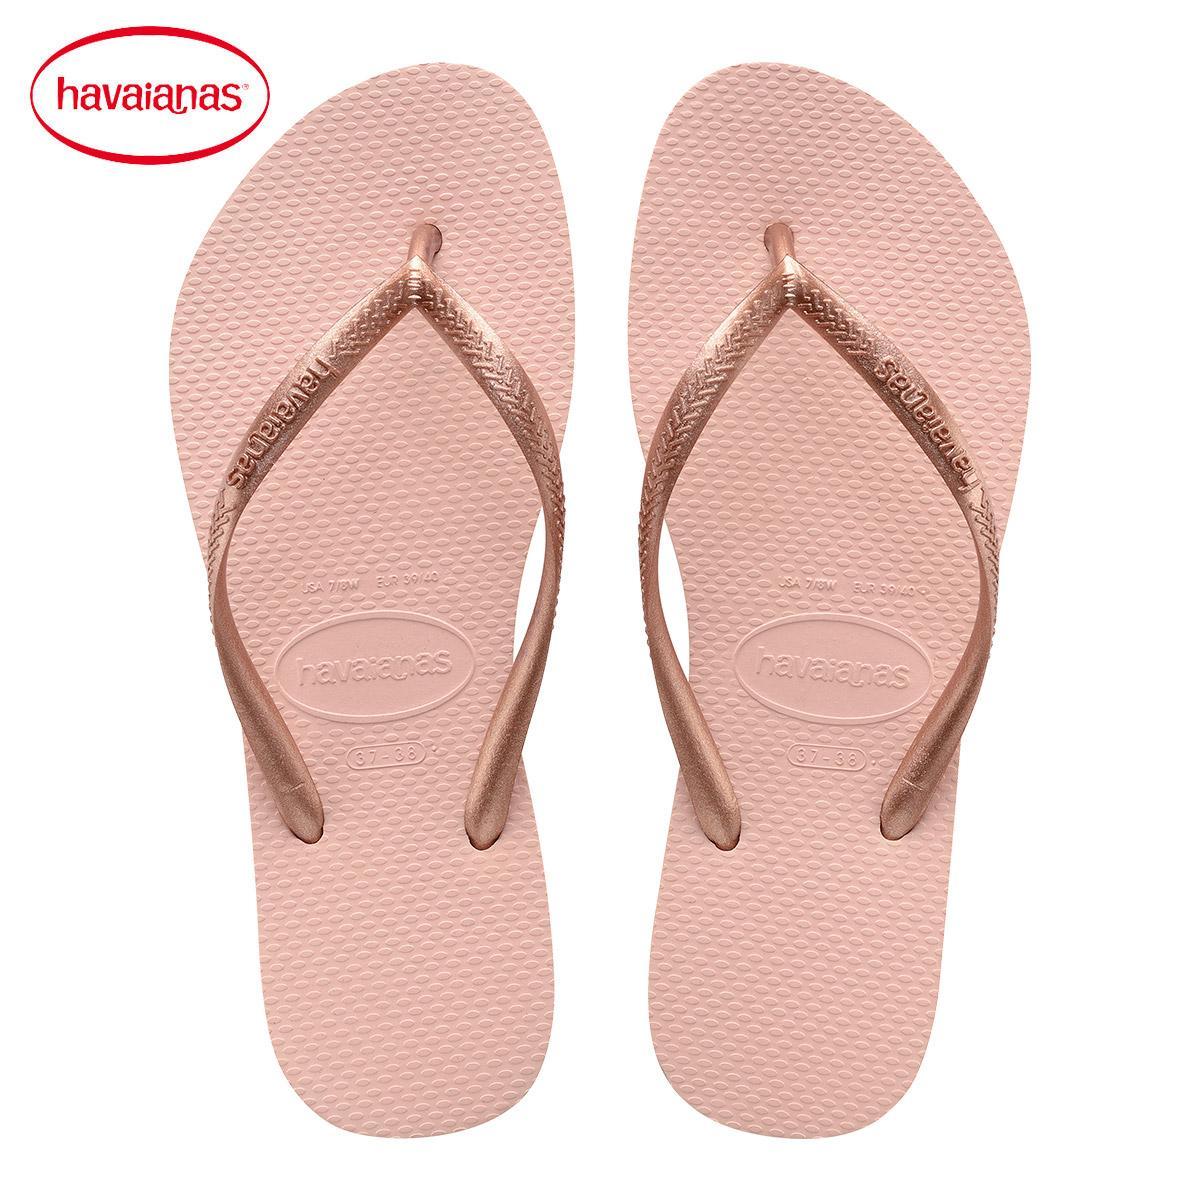 0570f022b63014 ... Havaianas Brazil 2018 New Products Flip-flops Women s Thin Drawstring  Slim Multi-color ...